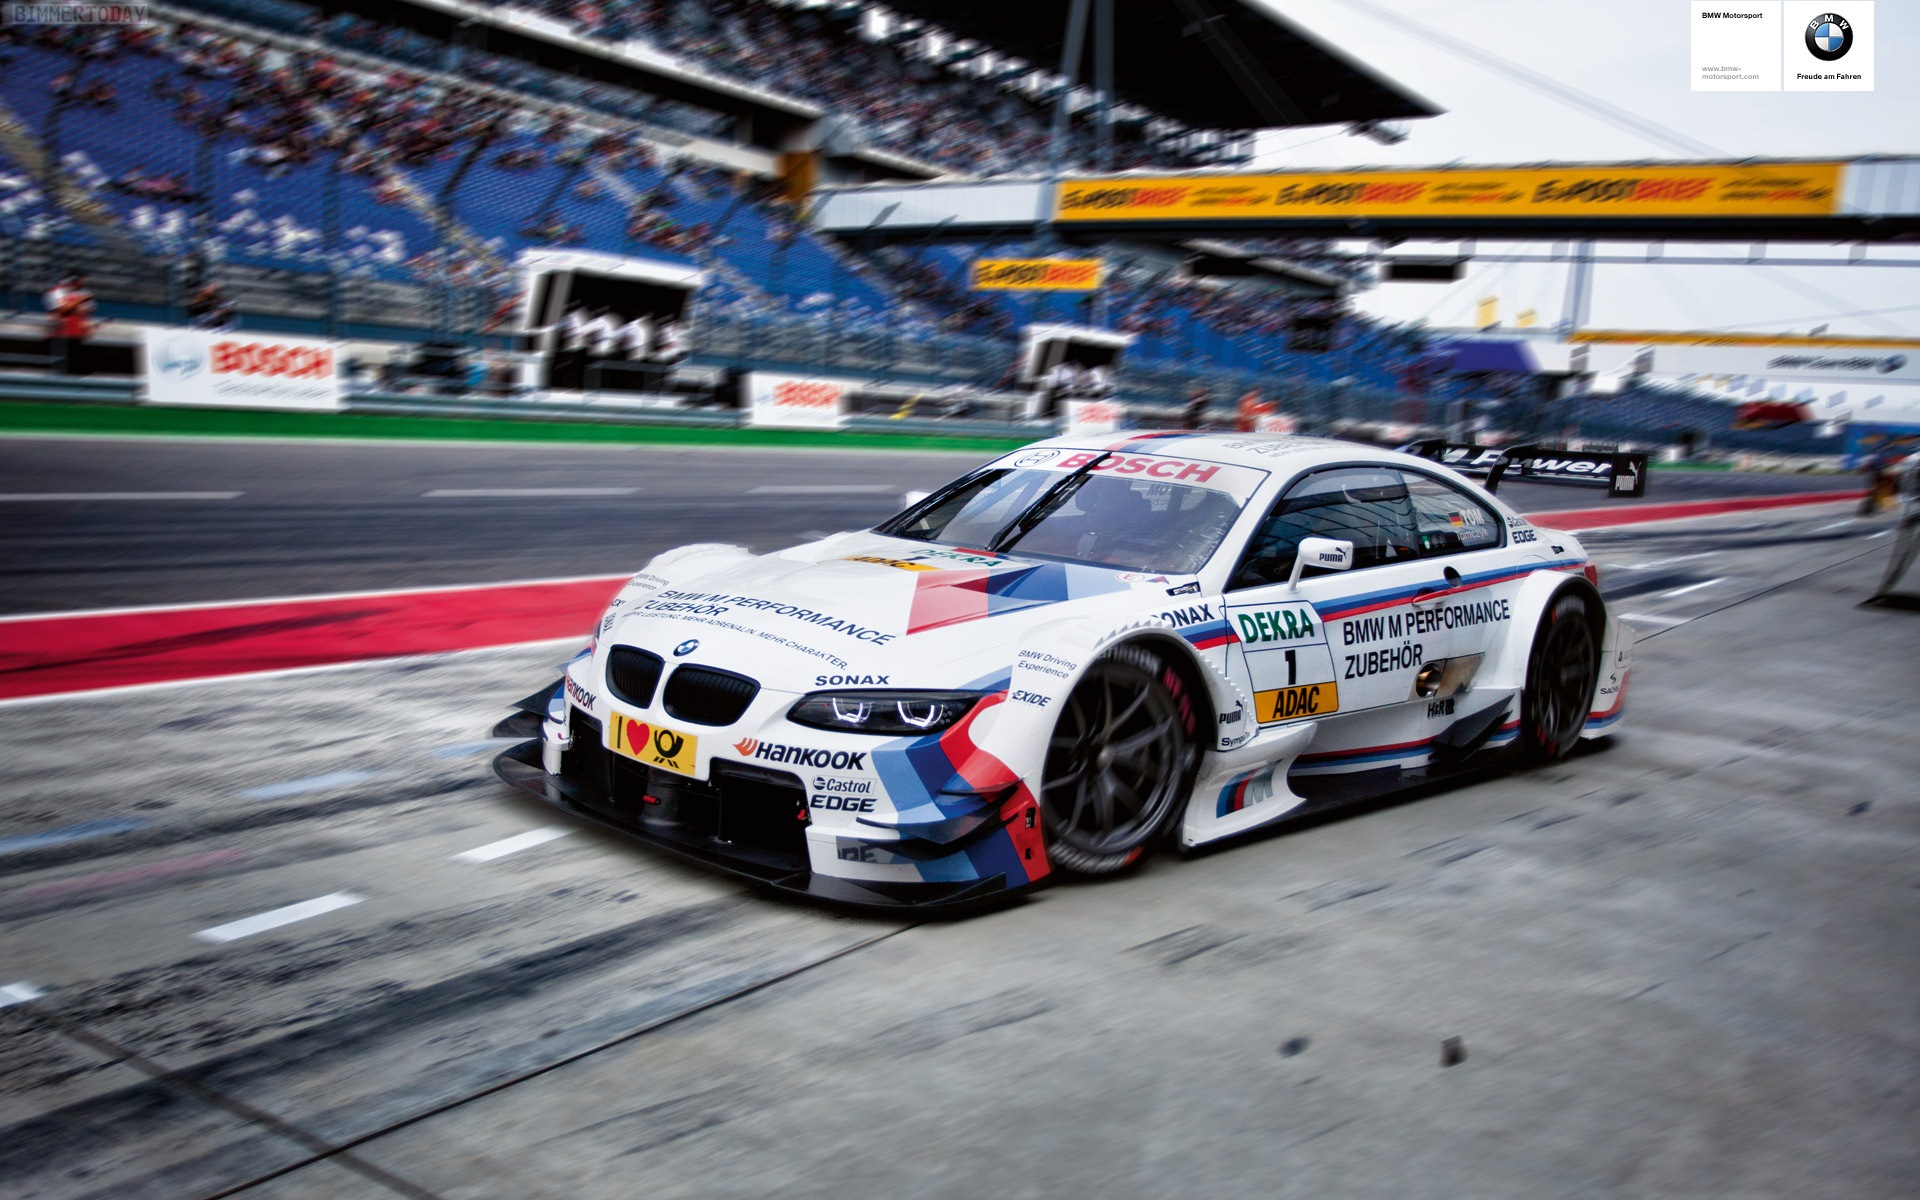 Wallpaper Android Motorsport: Motorsport Wallpapers